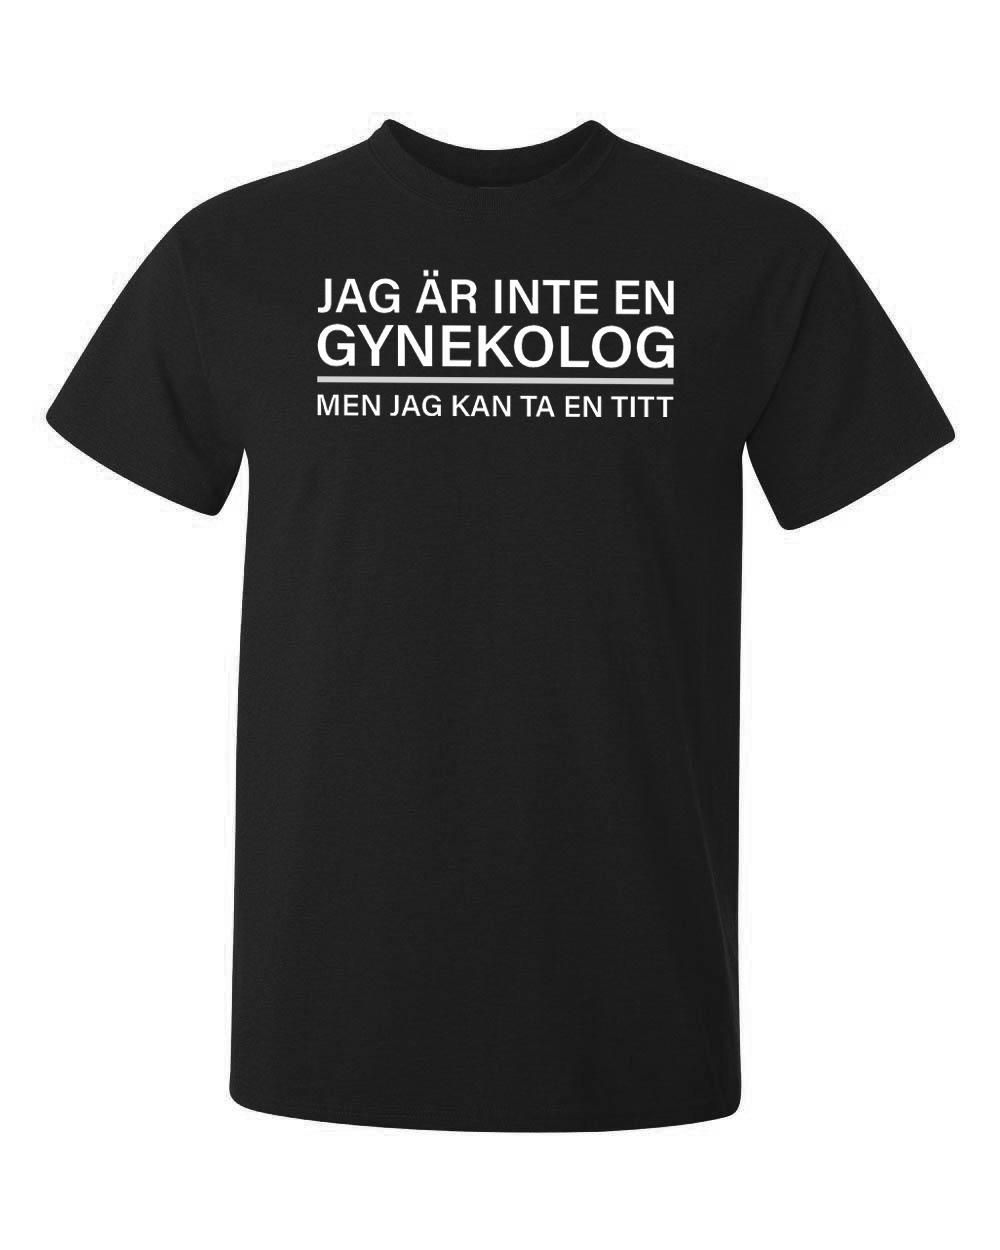 En rolig text tryckt på en svart t-shirt om yrke gynekolog